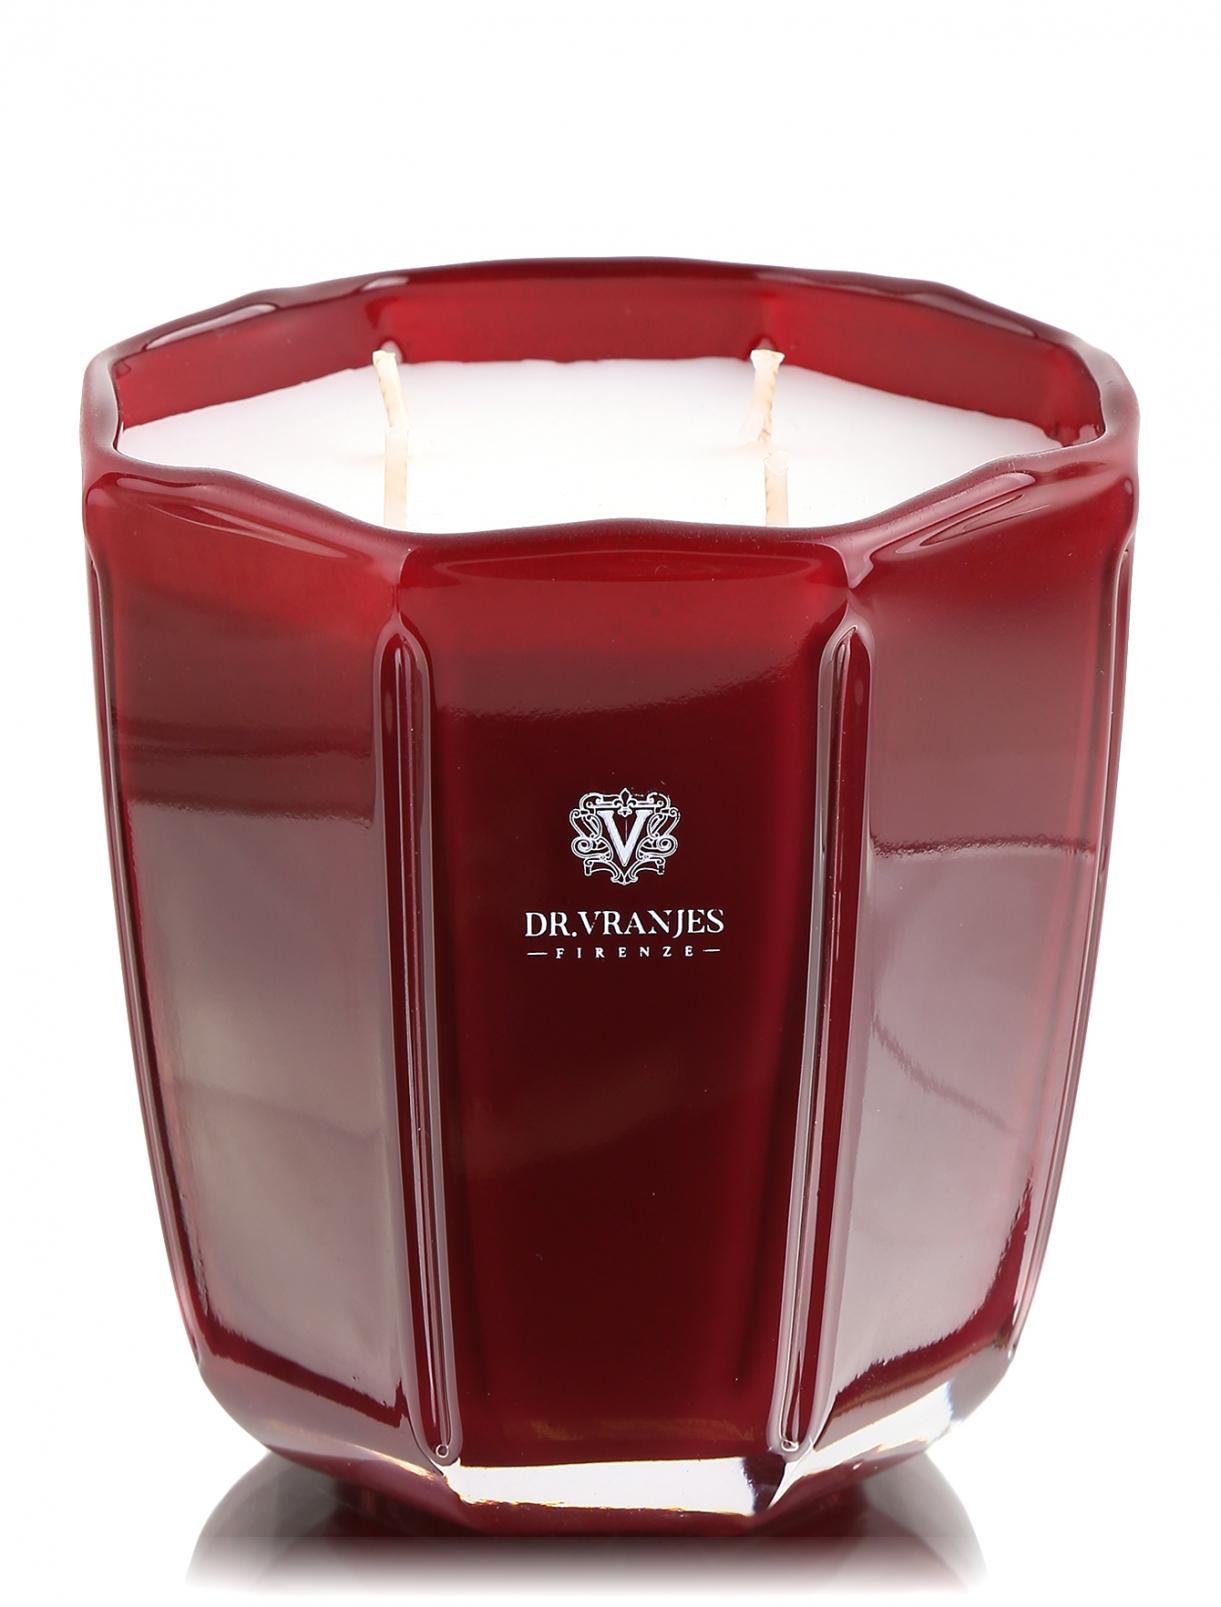 Свеча Melograno Red Tourmaline 500 г Home Fragrance Dr. Vranjes  –  Общий вид